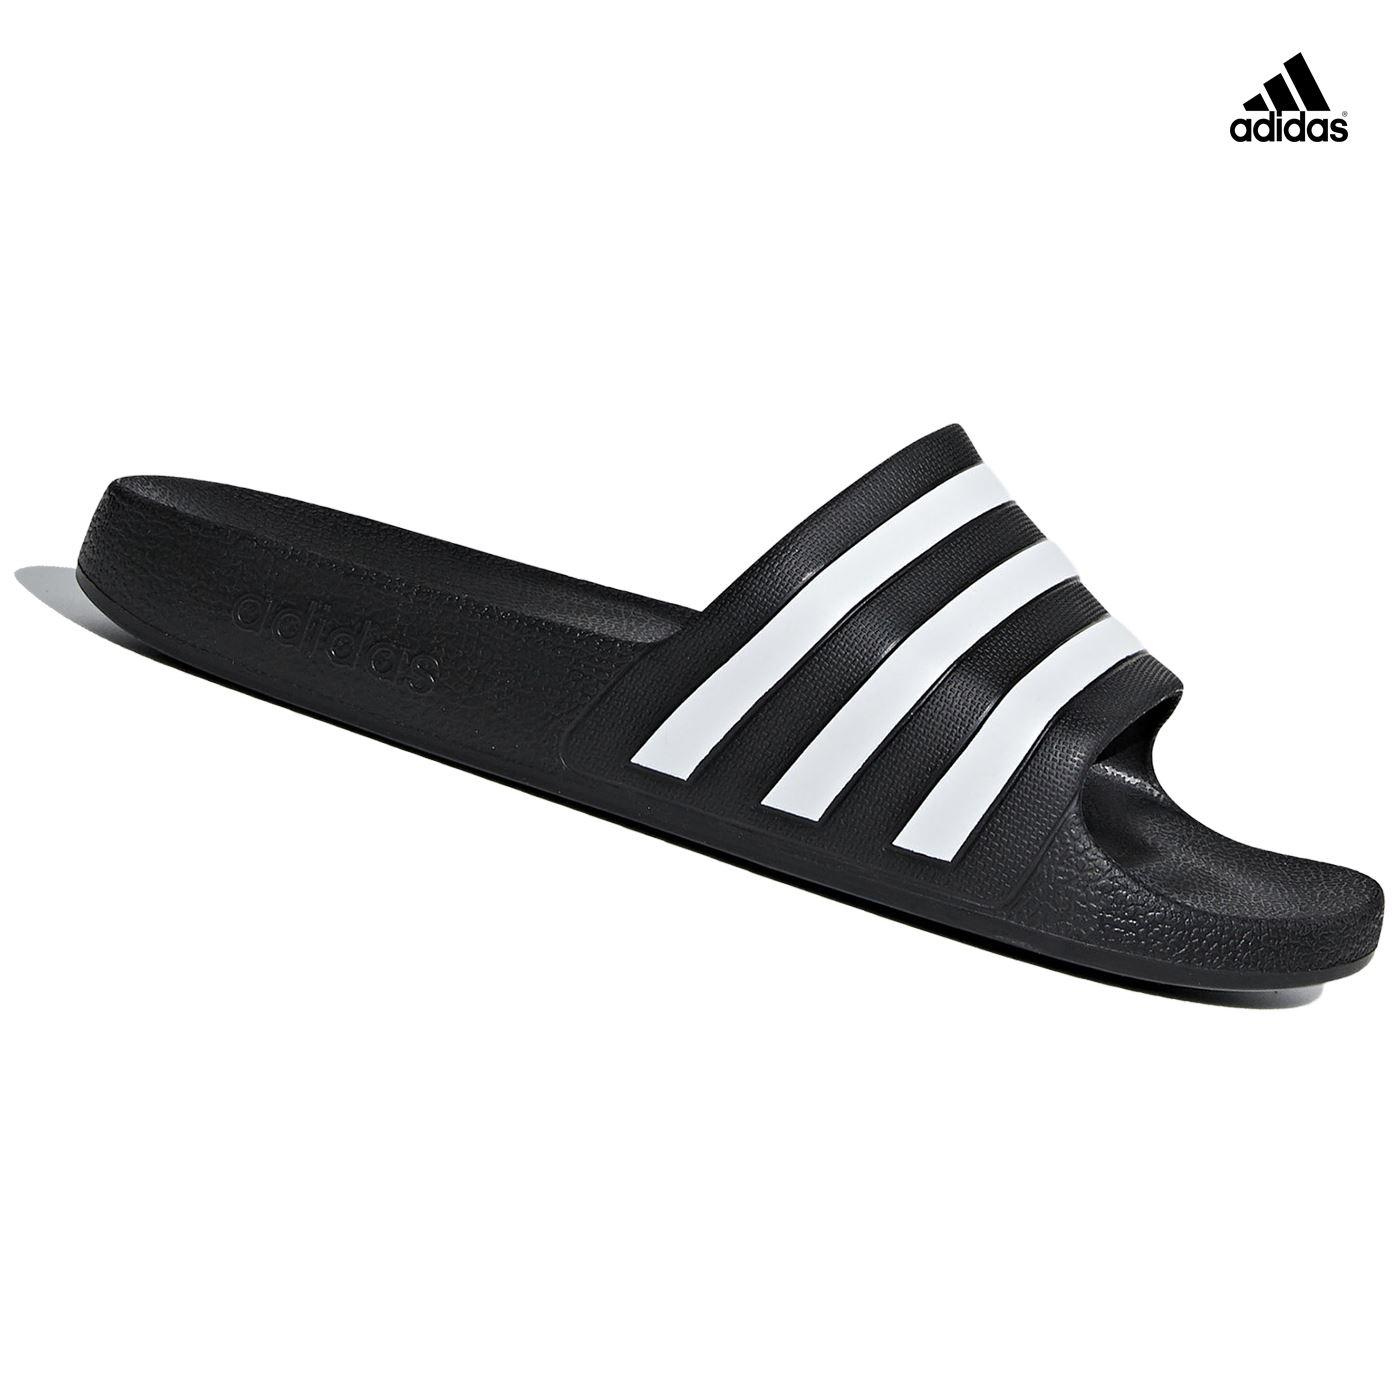 Adelette Boutique Aqua Adidas Negro Sandalia Boys Yf7gbv6y